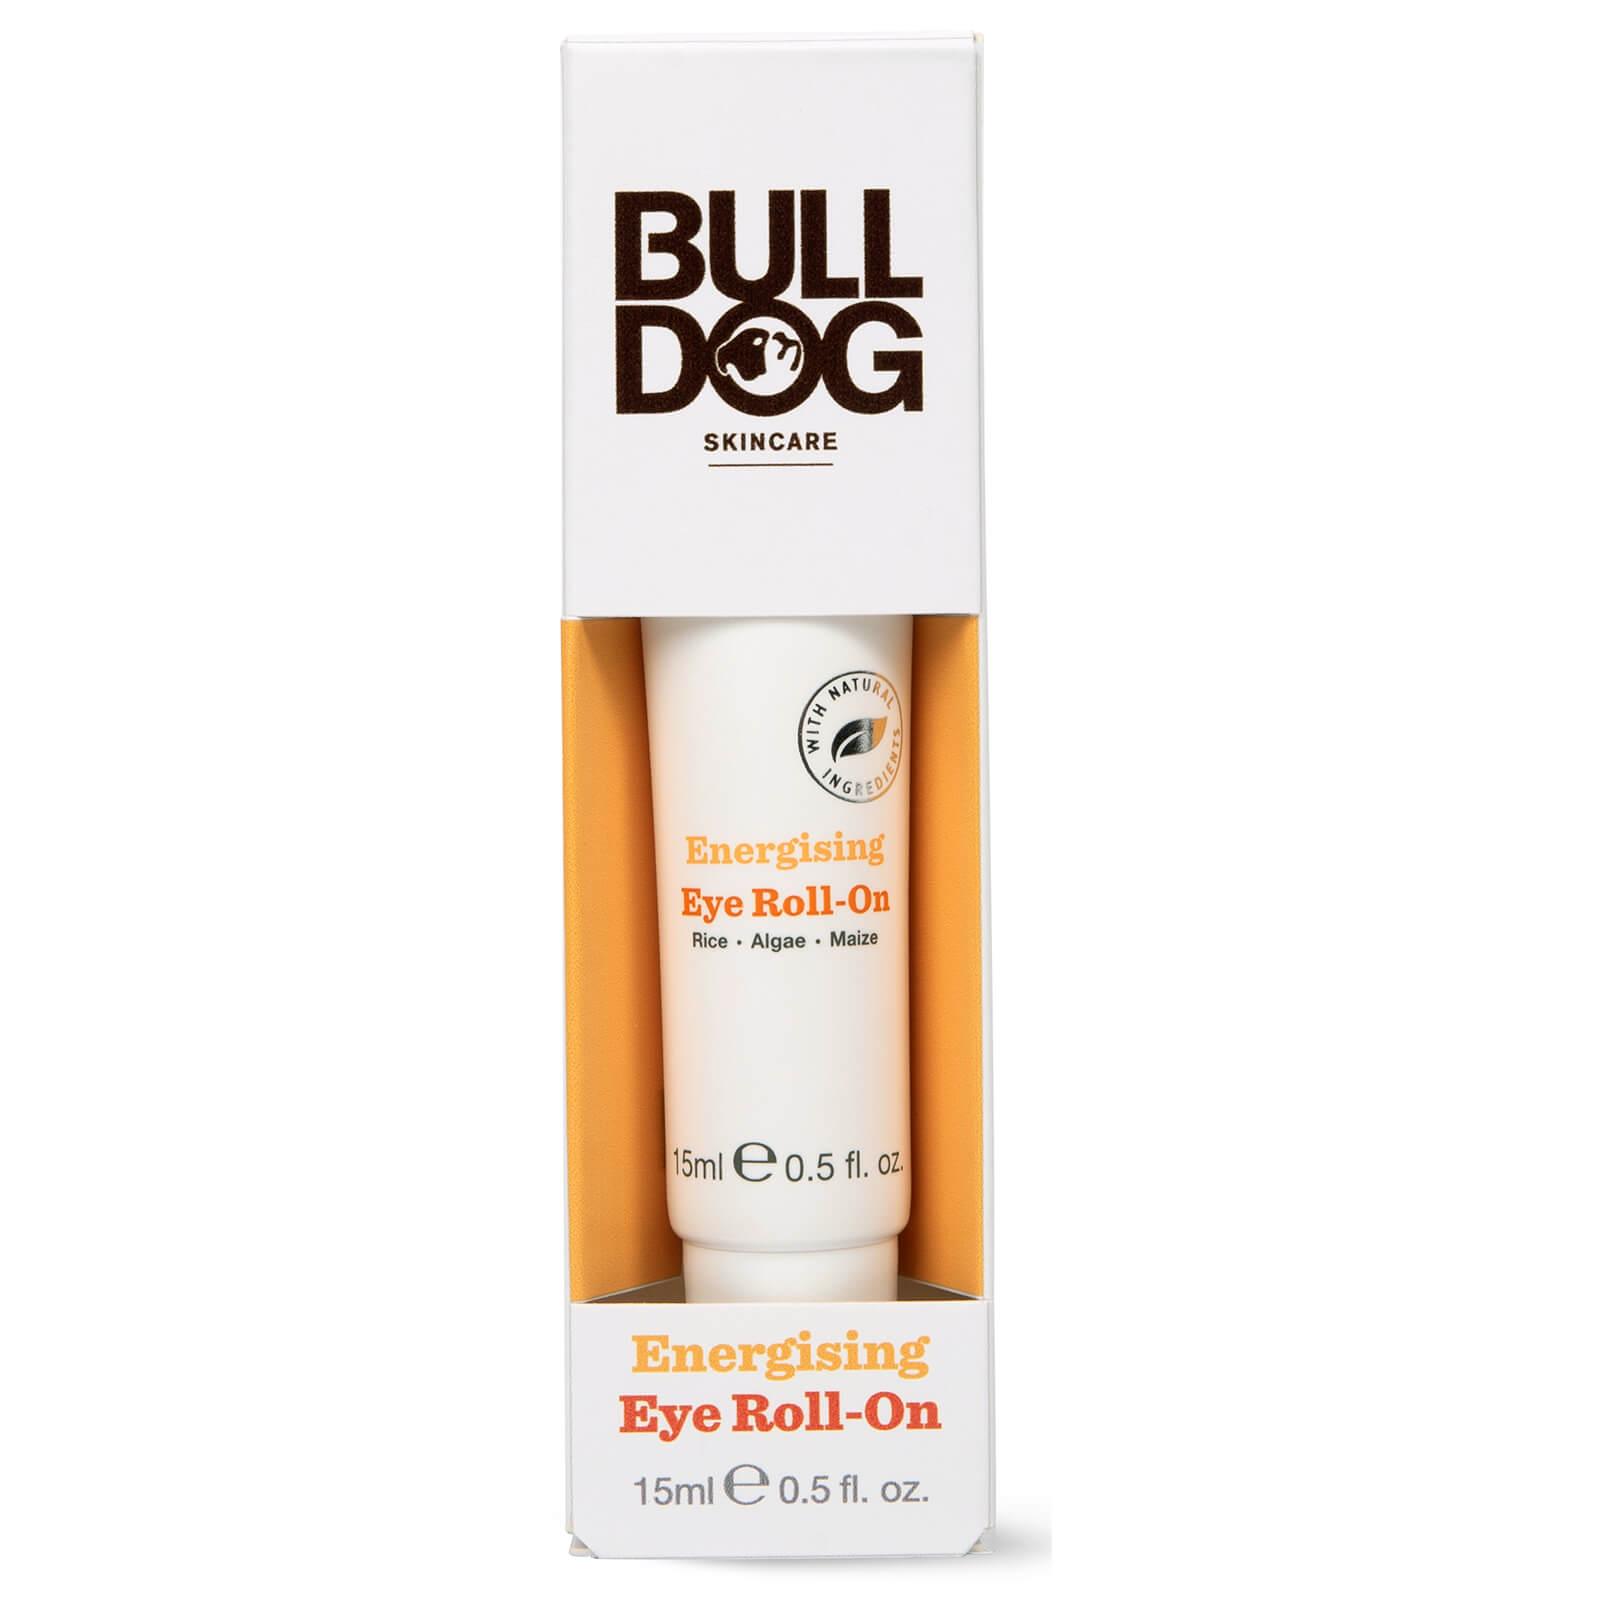 Купить Bulldog Energising Eye Roll On 15ml